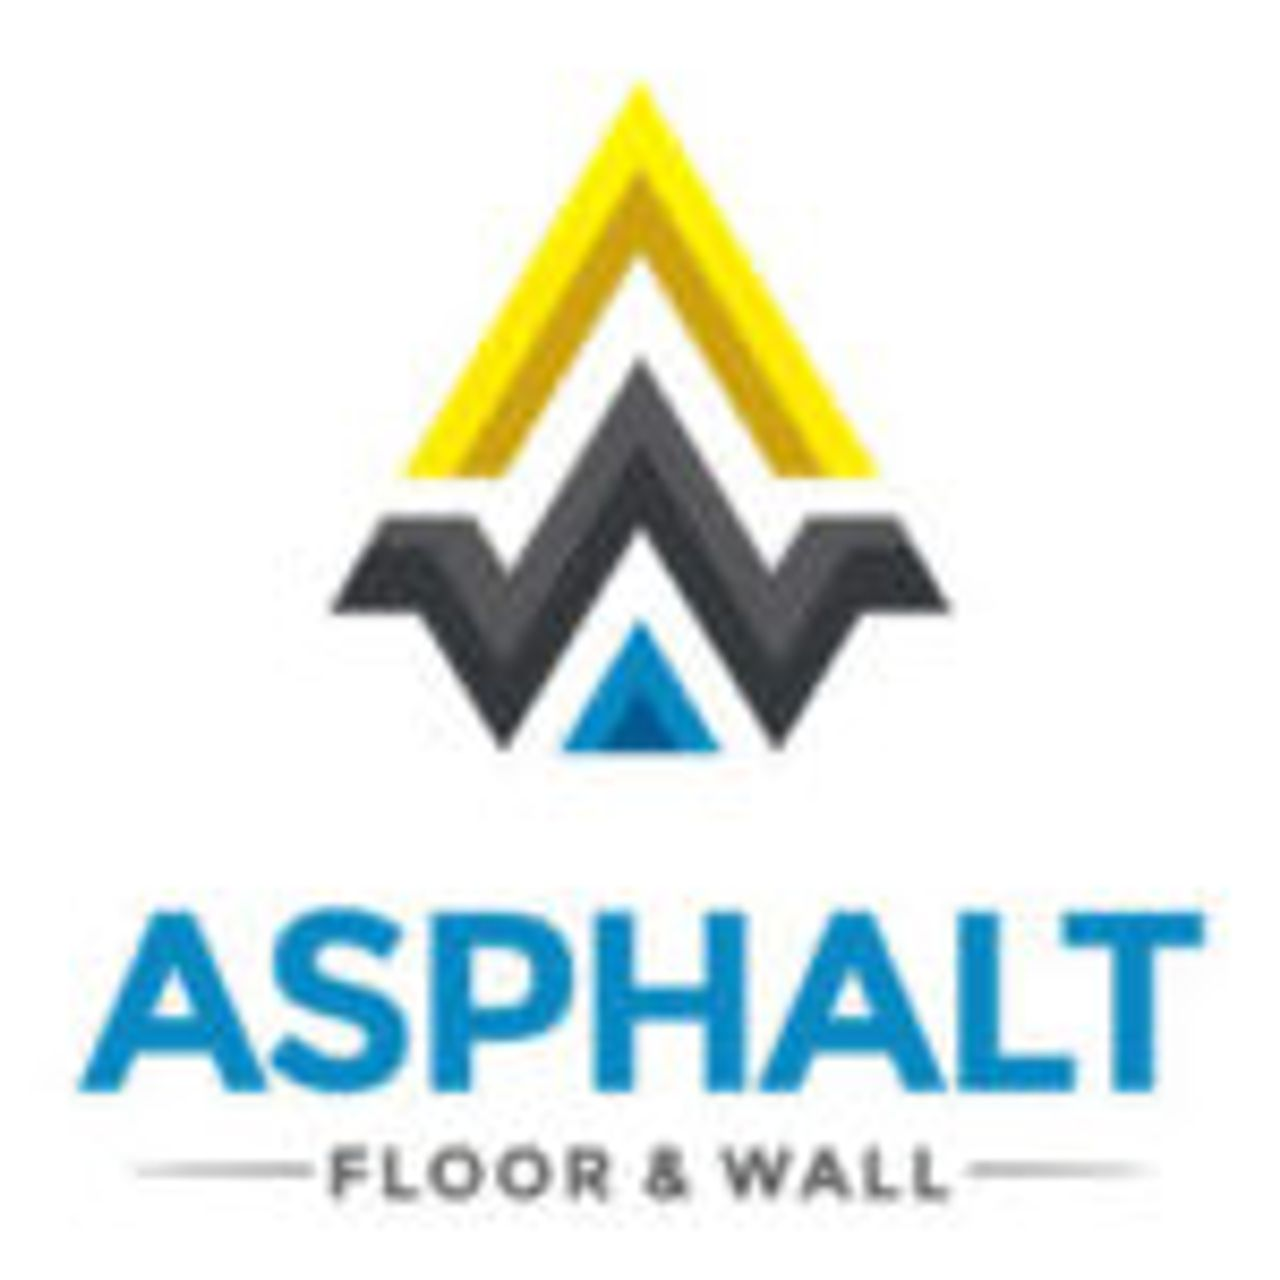 Afbeelding Asphalt Art logo